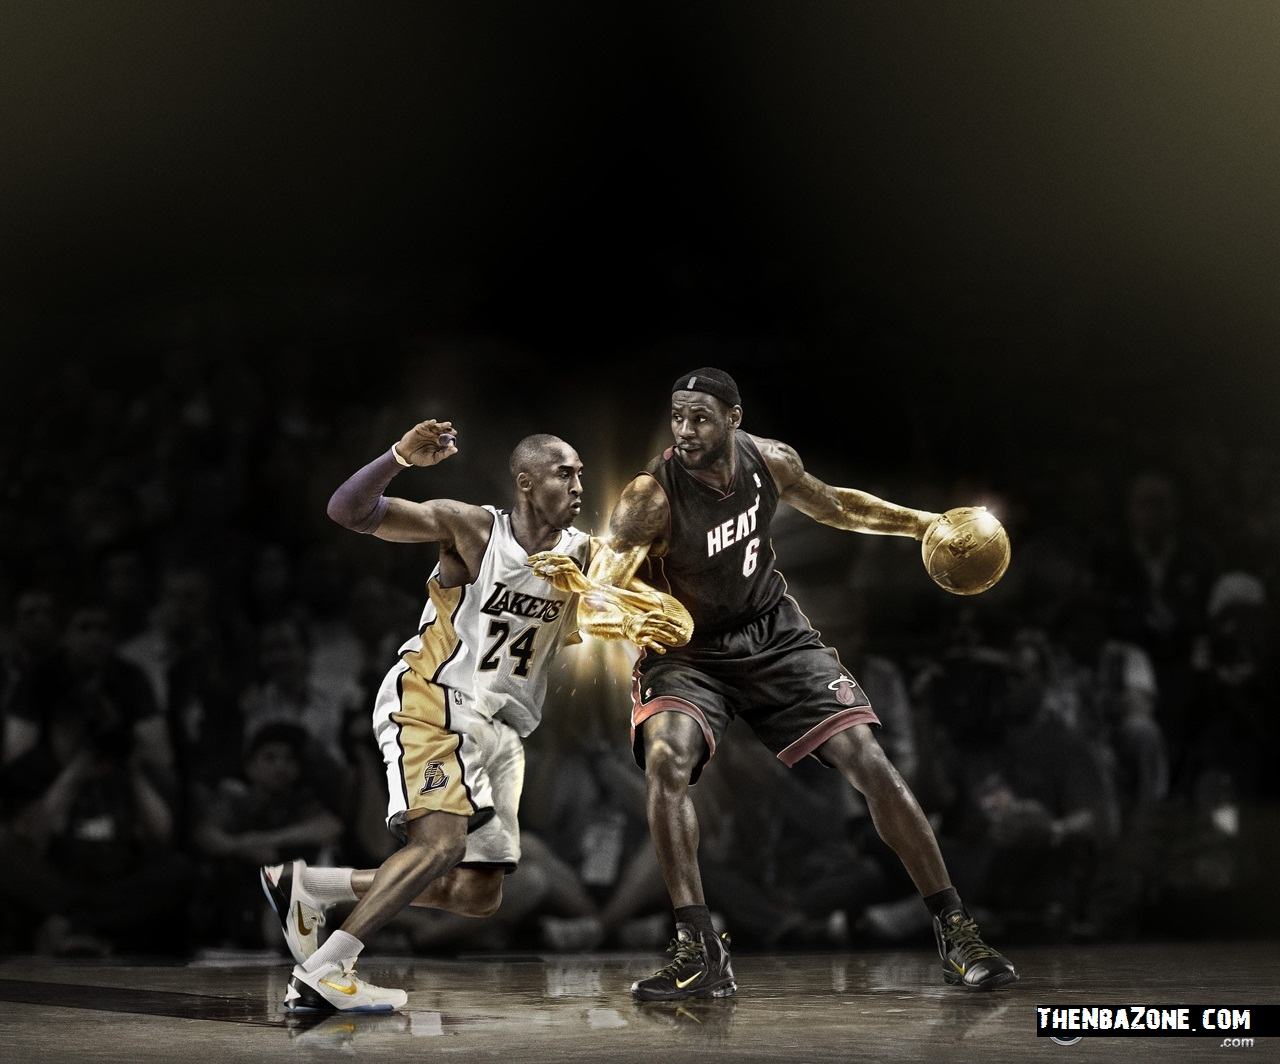 Best Nba Playoffs 2012 Wallpapers Hd Thenbazone Com